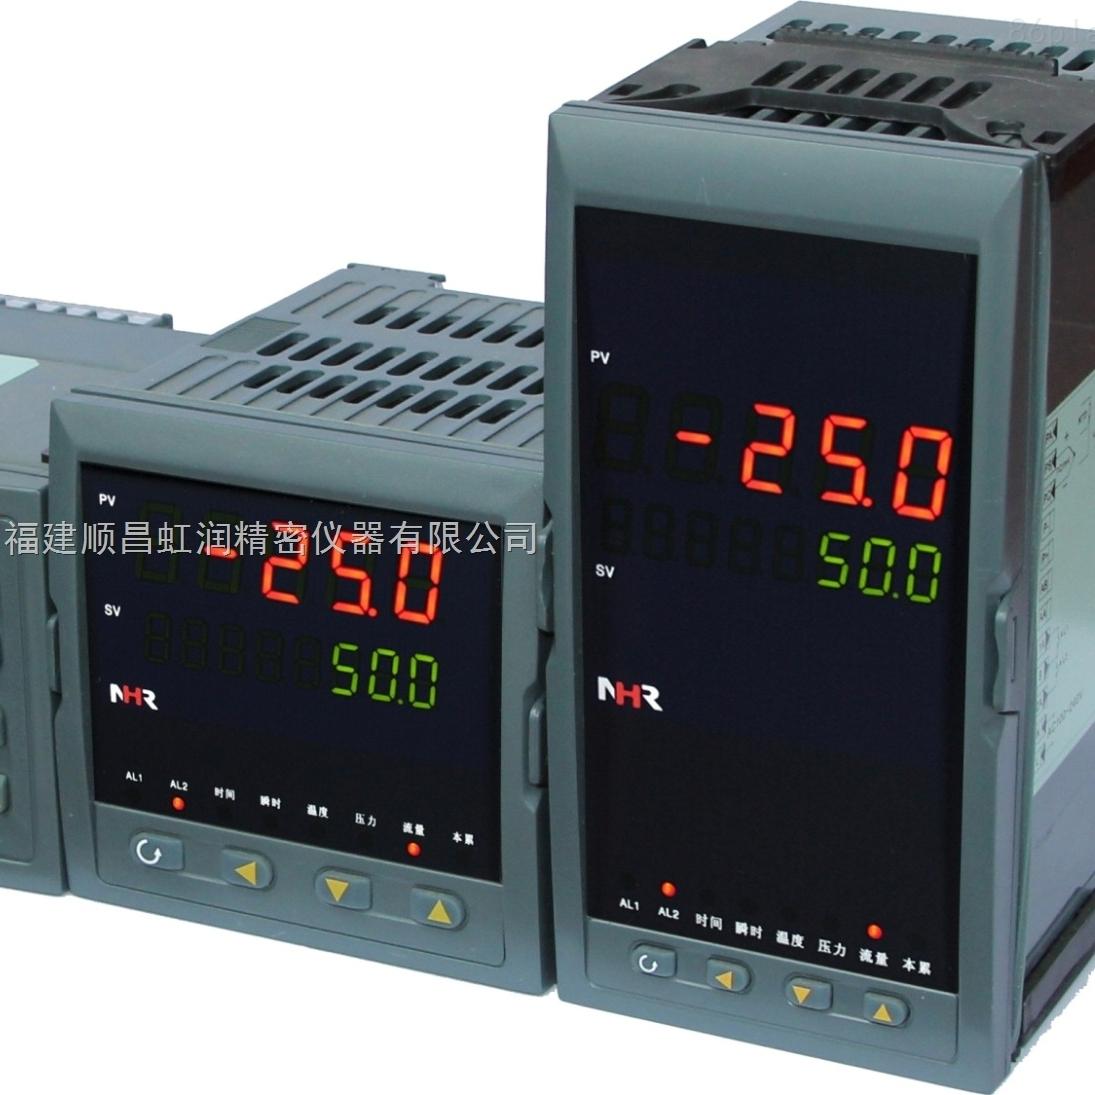 NHR-5610系列热量积算控制仪